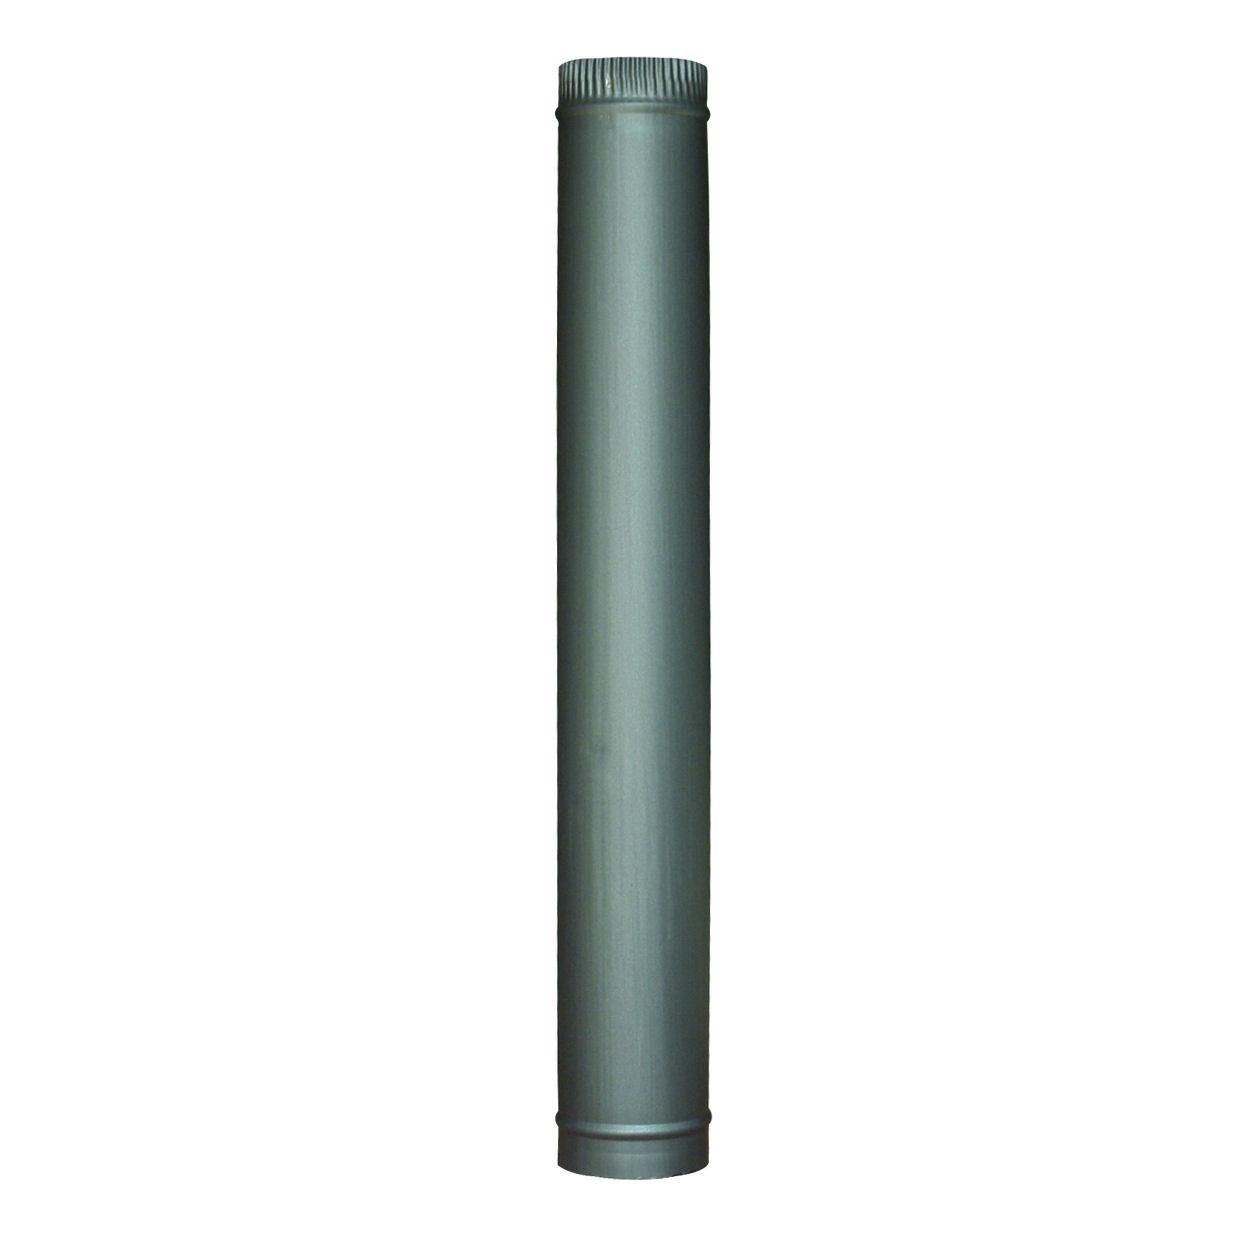 Steel Matt Black Chimney Flue Pipes 5 6 For Multifuel Wood Log